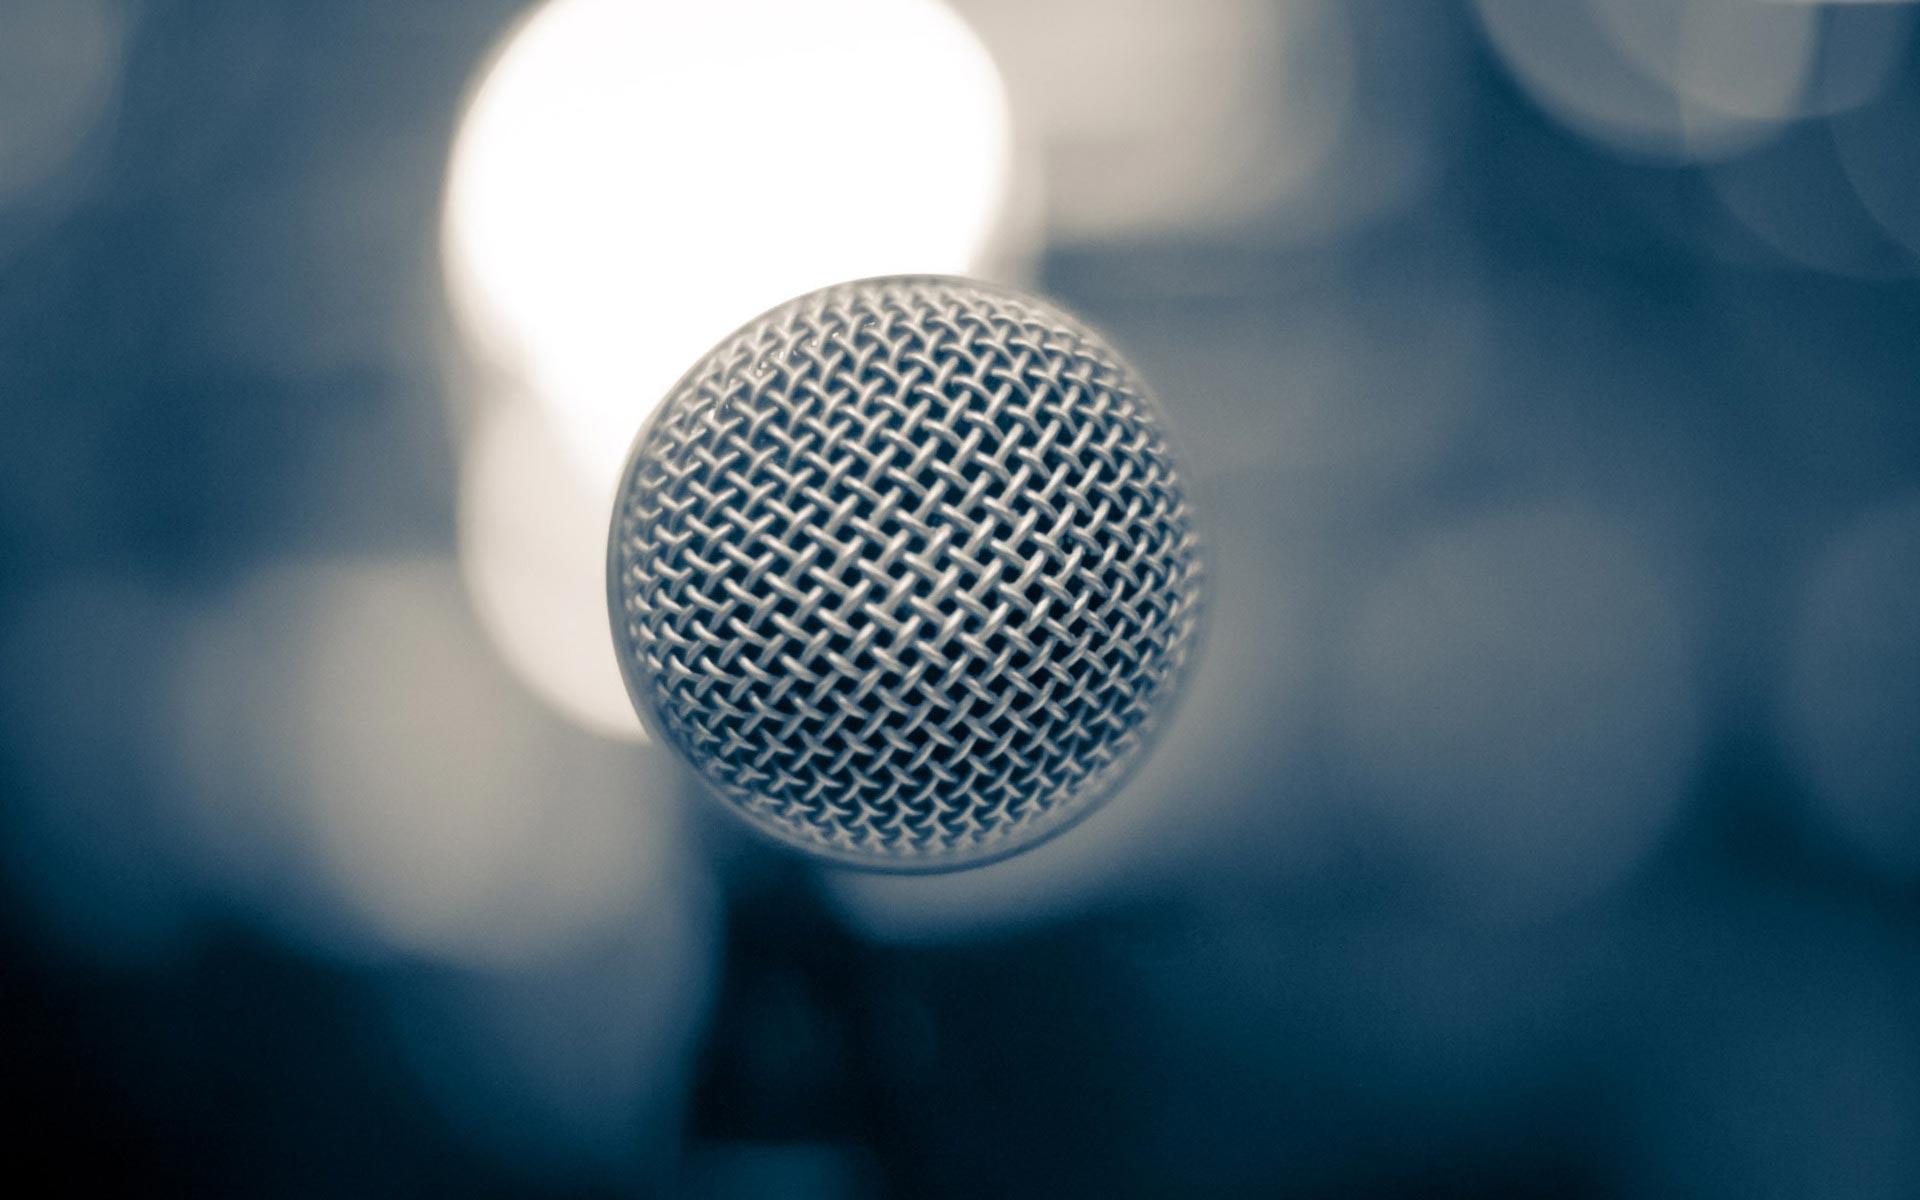 microphone wallpaper hd 34325